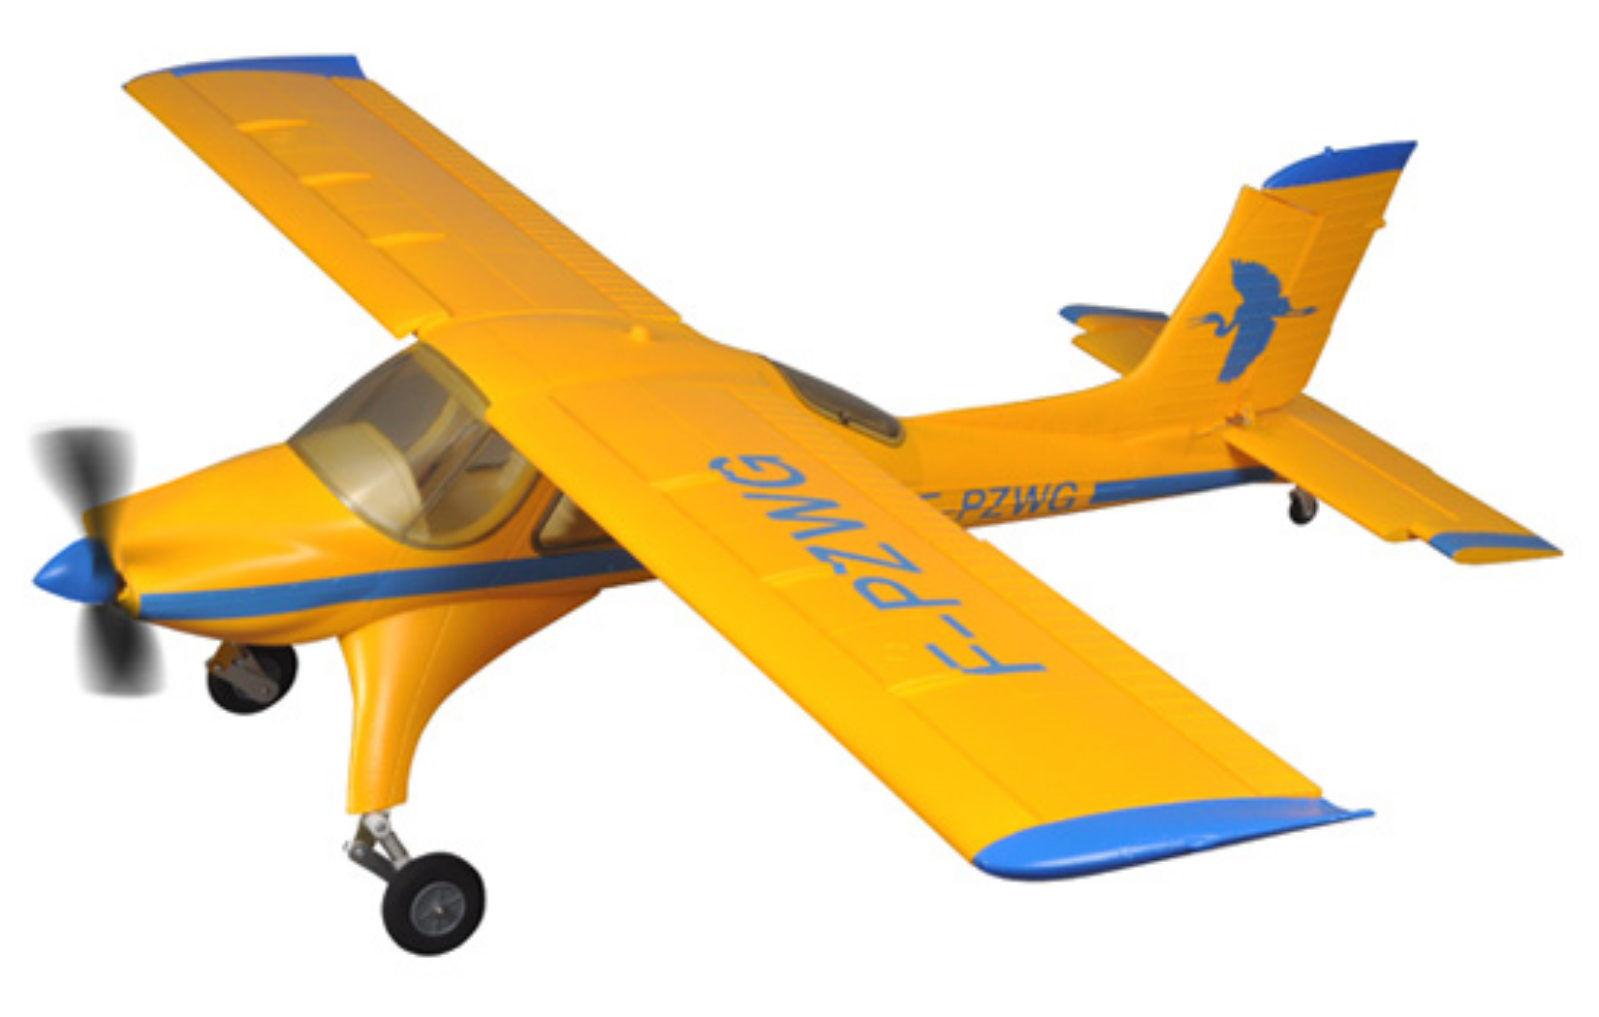 T2m t4515 Wilga 2000 3 alineación brushless motor avión